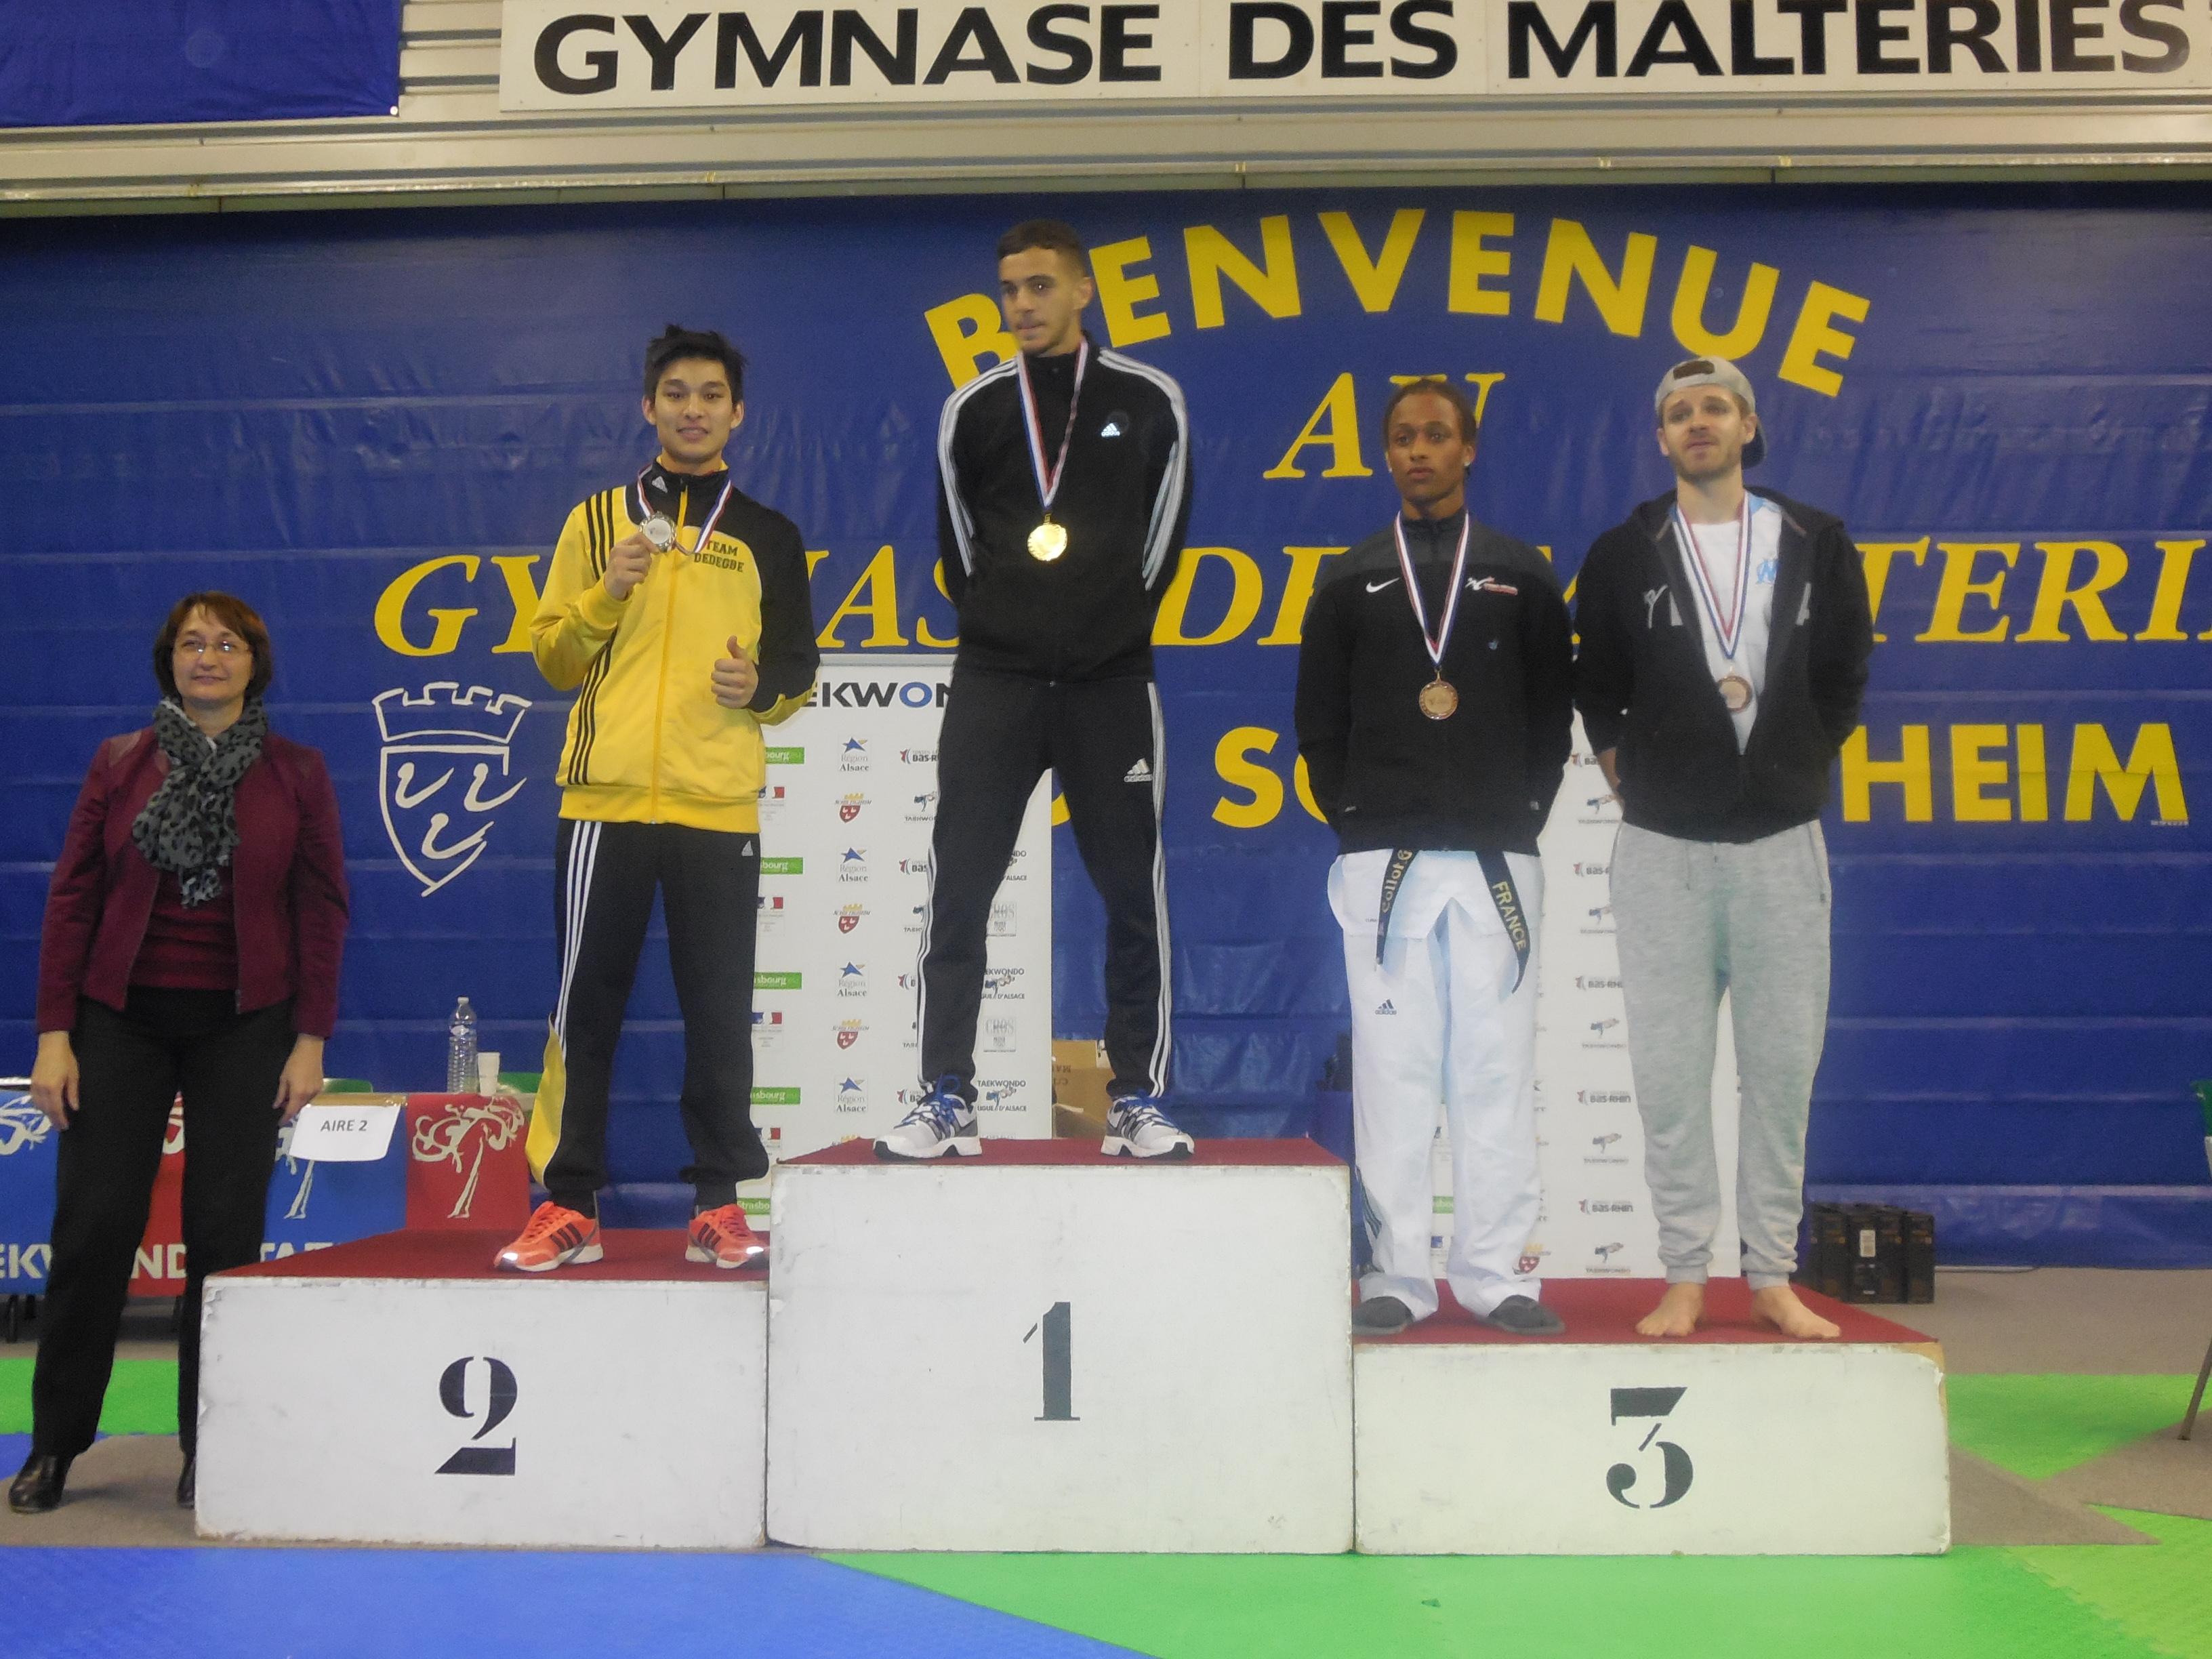 Taekwondo : Teddy Teng Médaille d'Argent à l'Open Internationale d'Alsace 2015